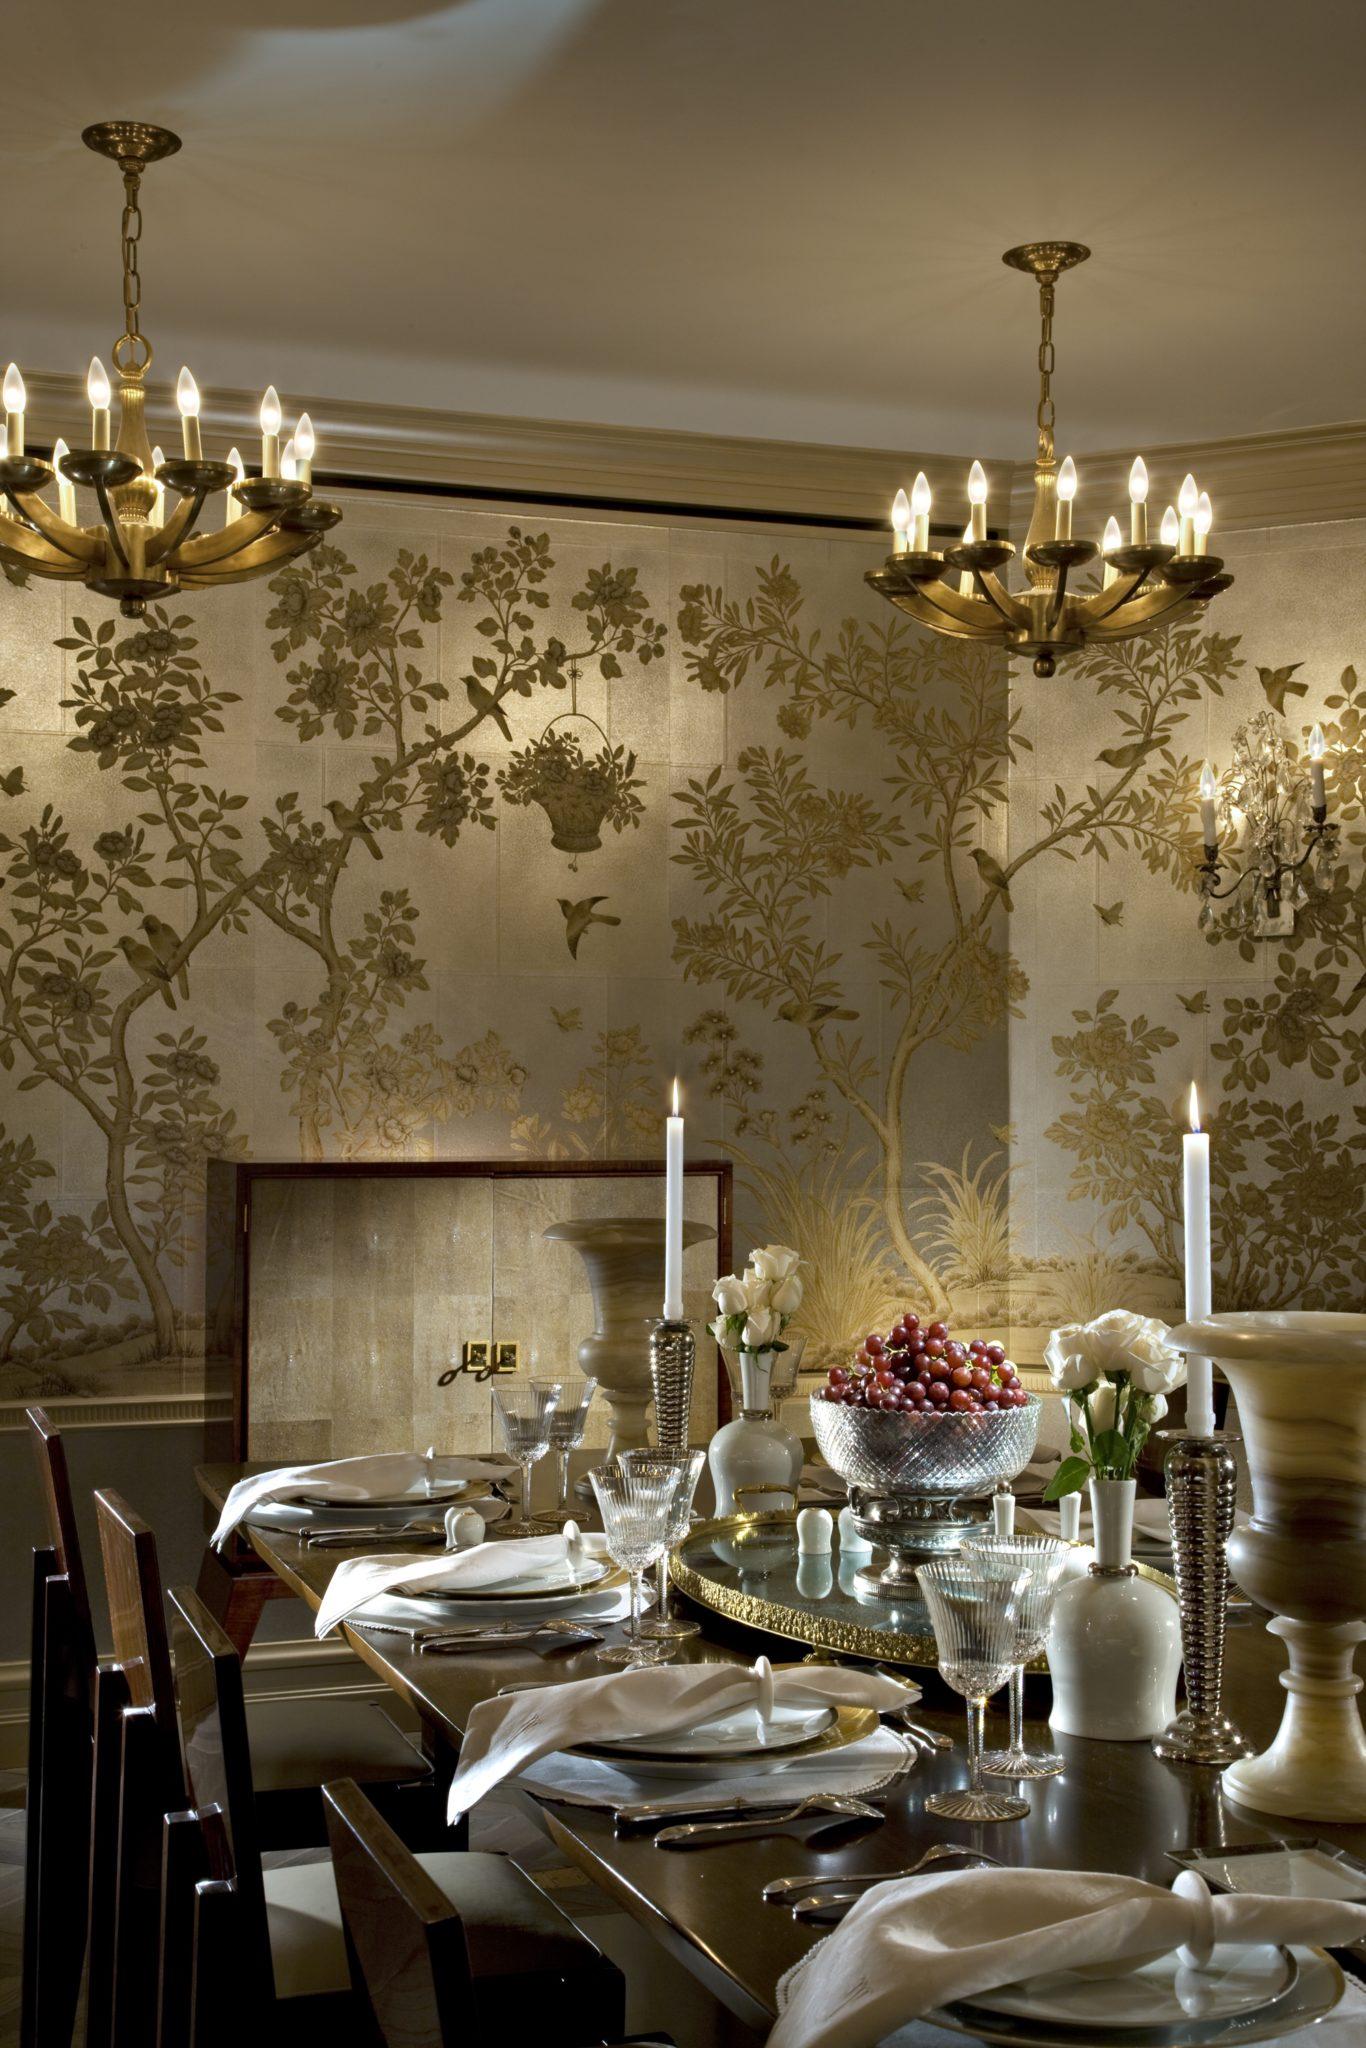 gracie wallpaper so versatile with contemporary furniture by Penny Drue Baird - Dessins LLC